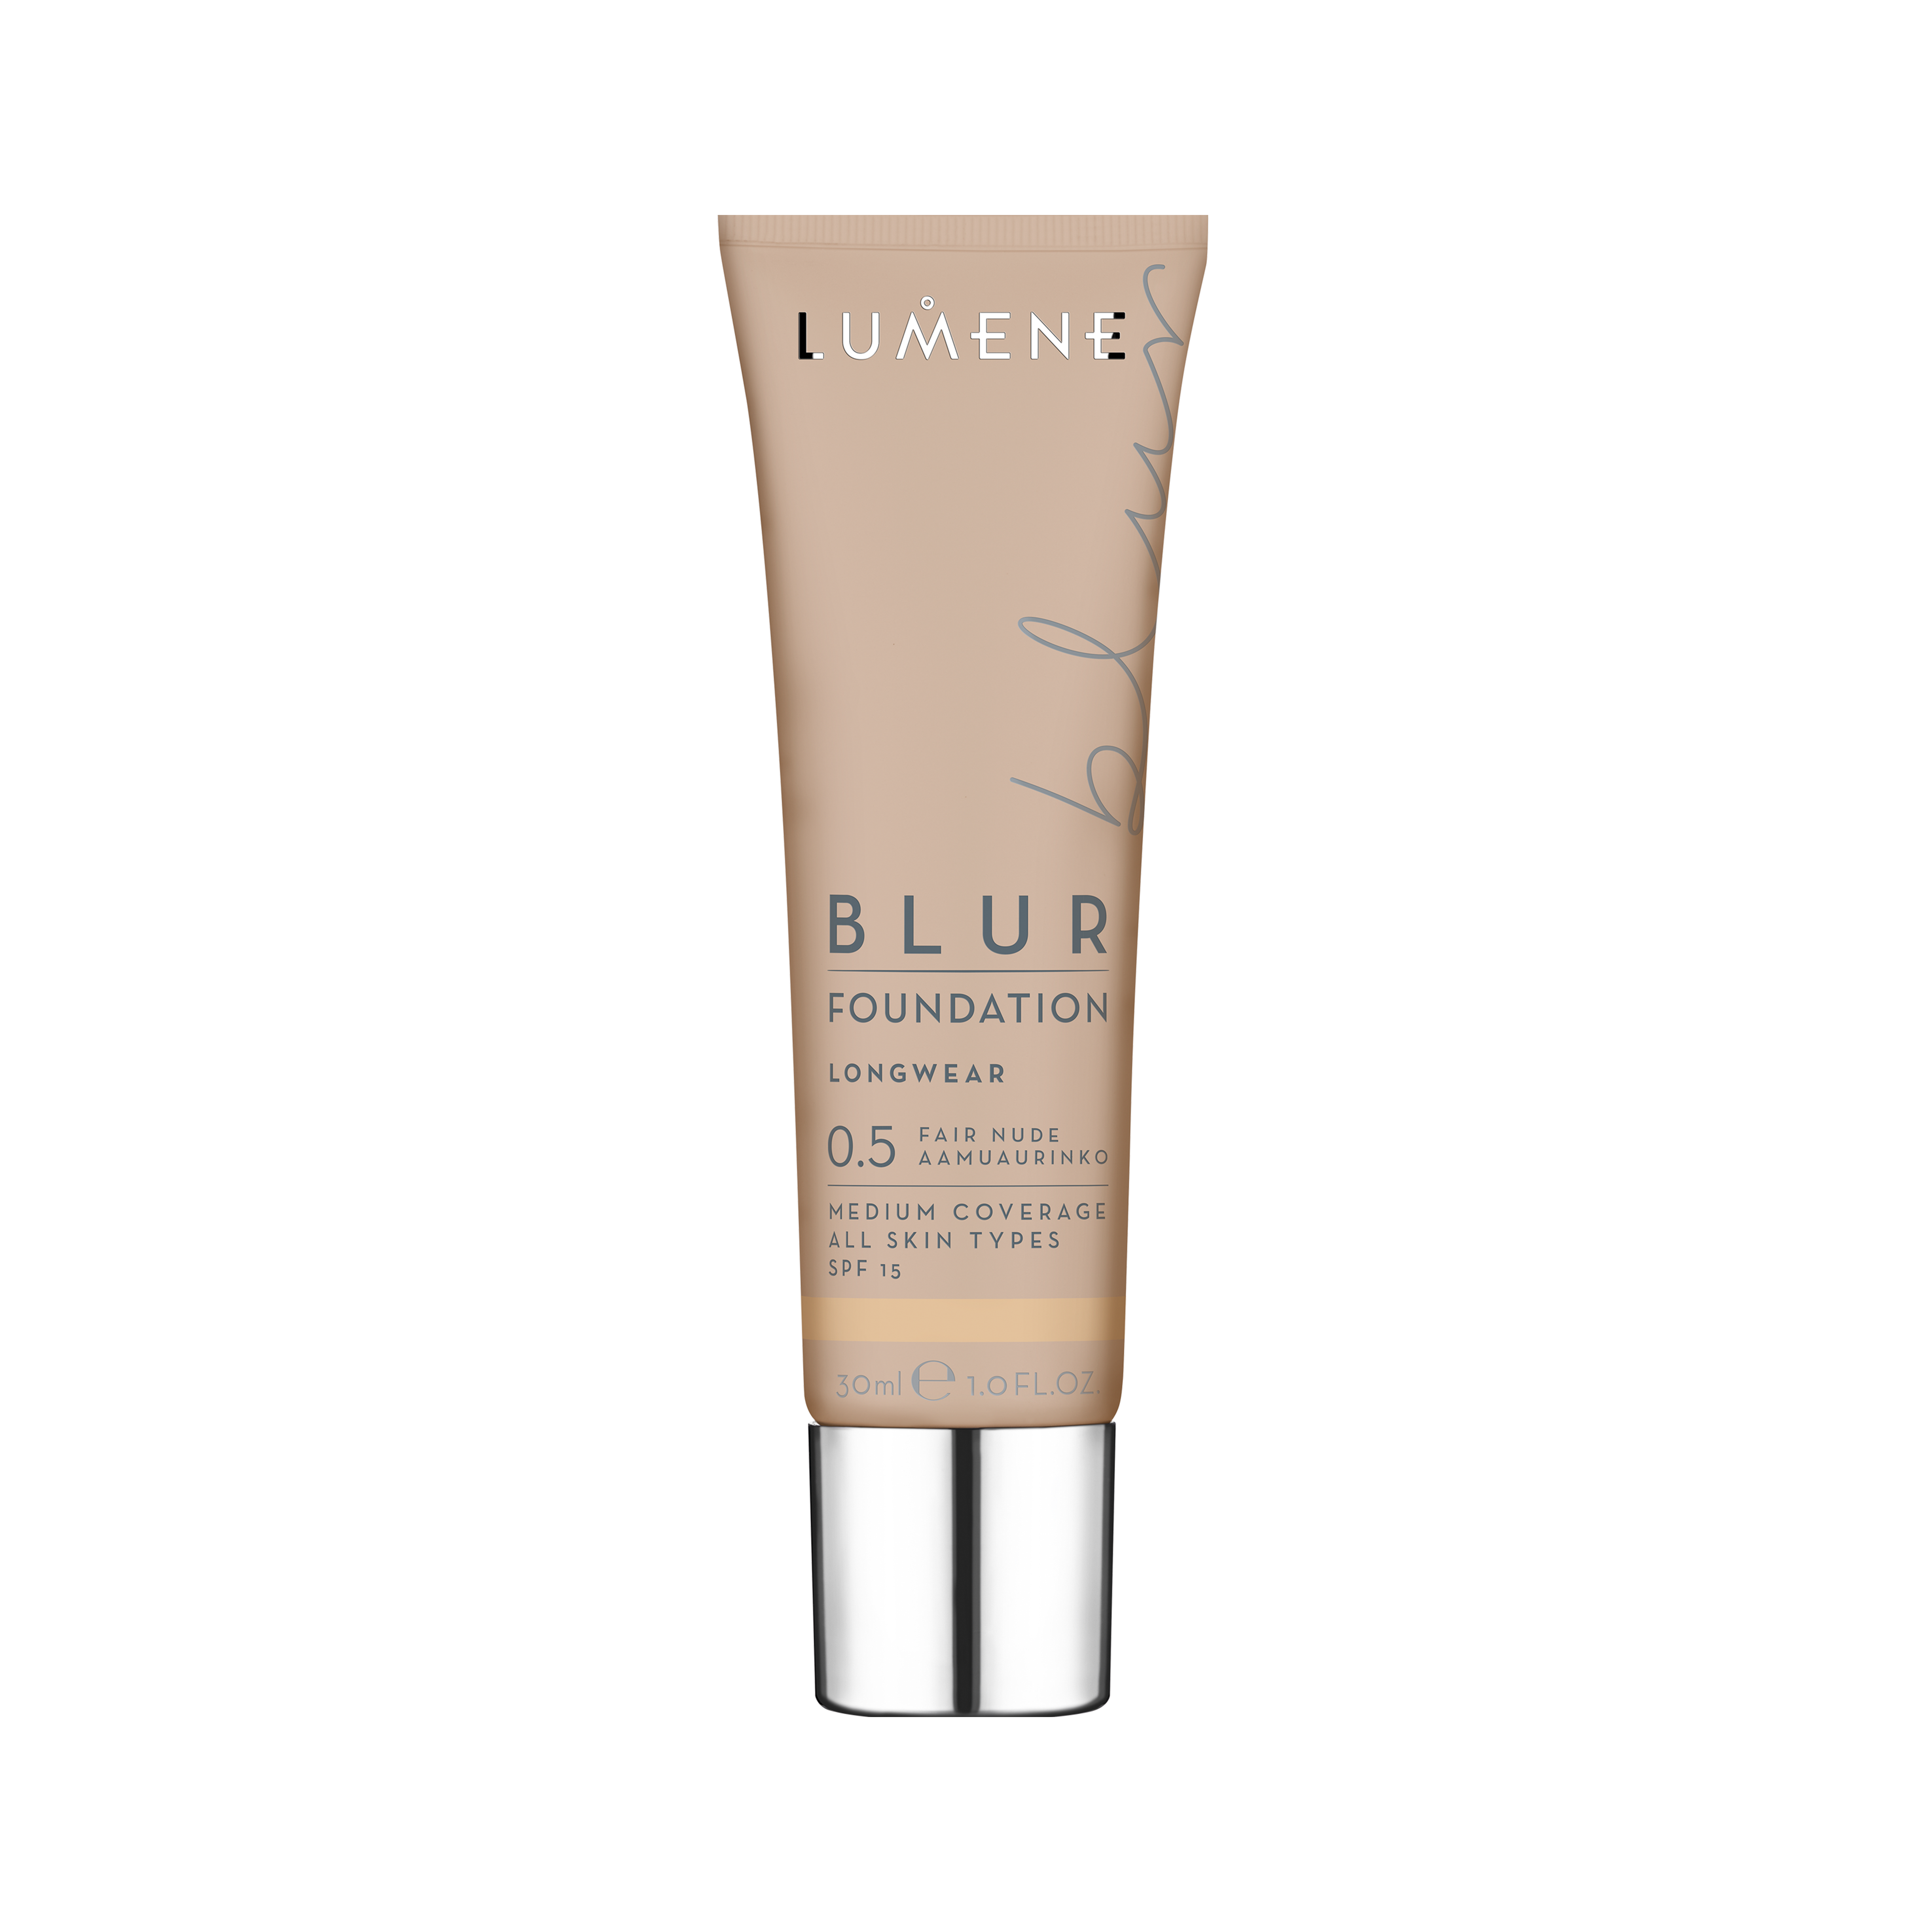 Blur Foundation